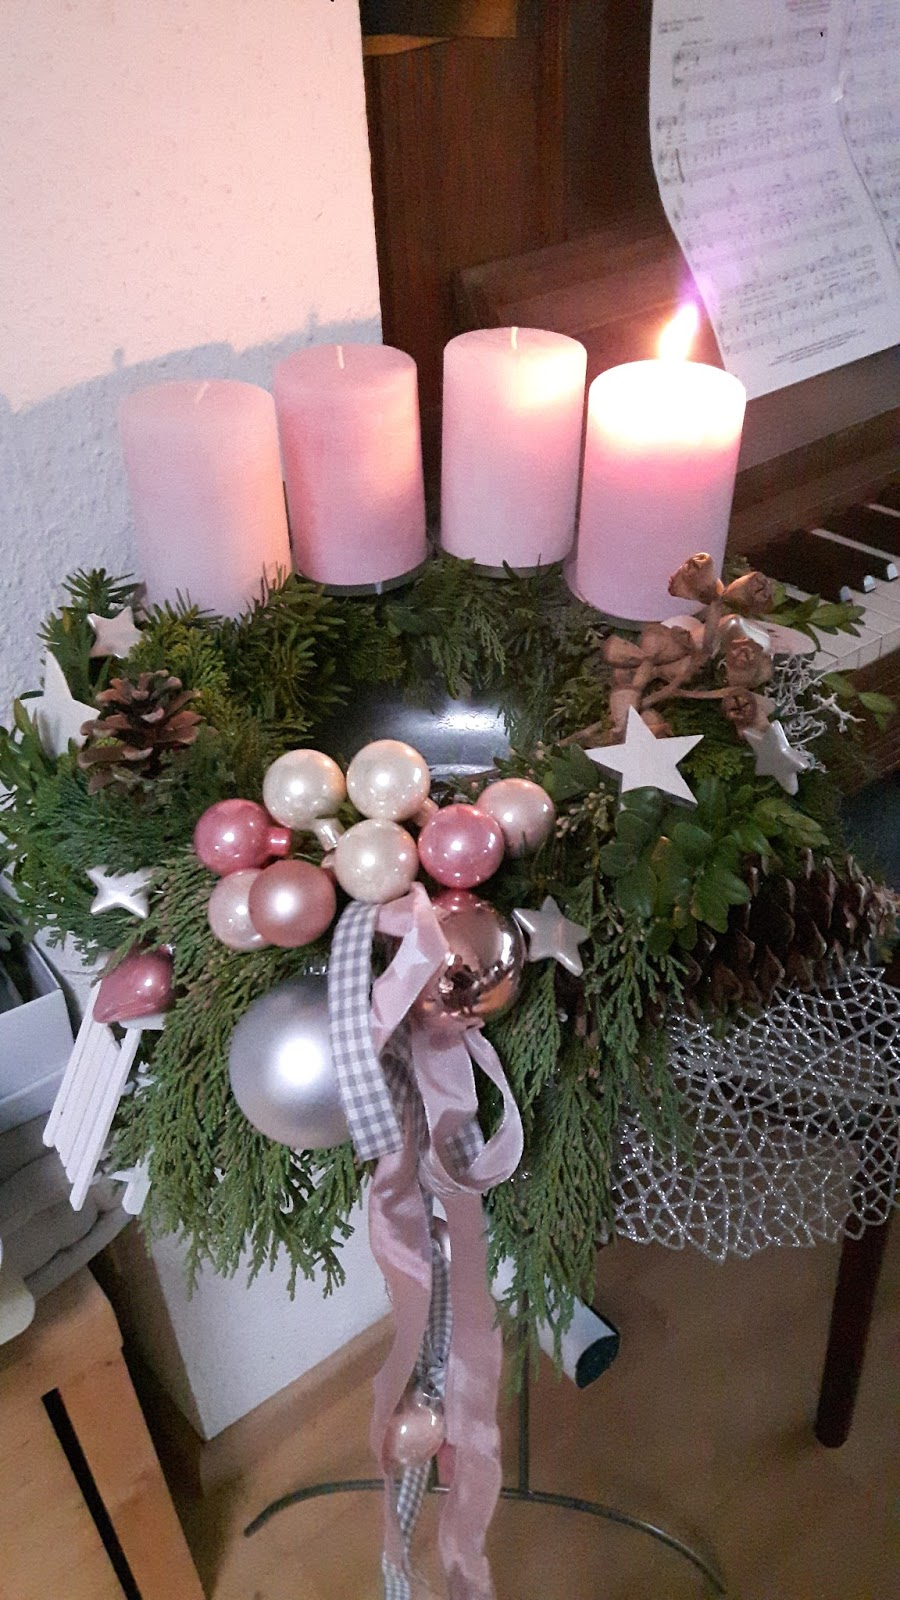 Heinzcl With Love Der 1 Dezember